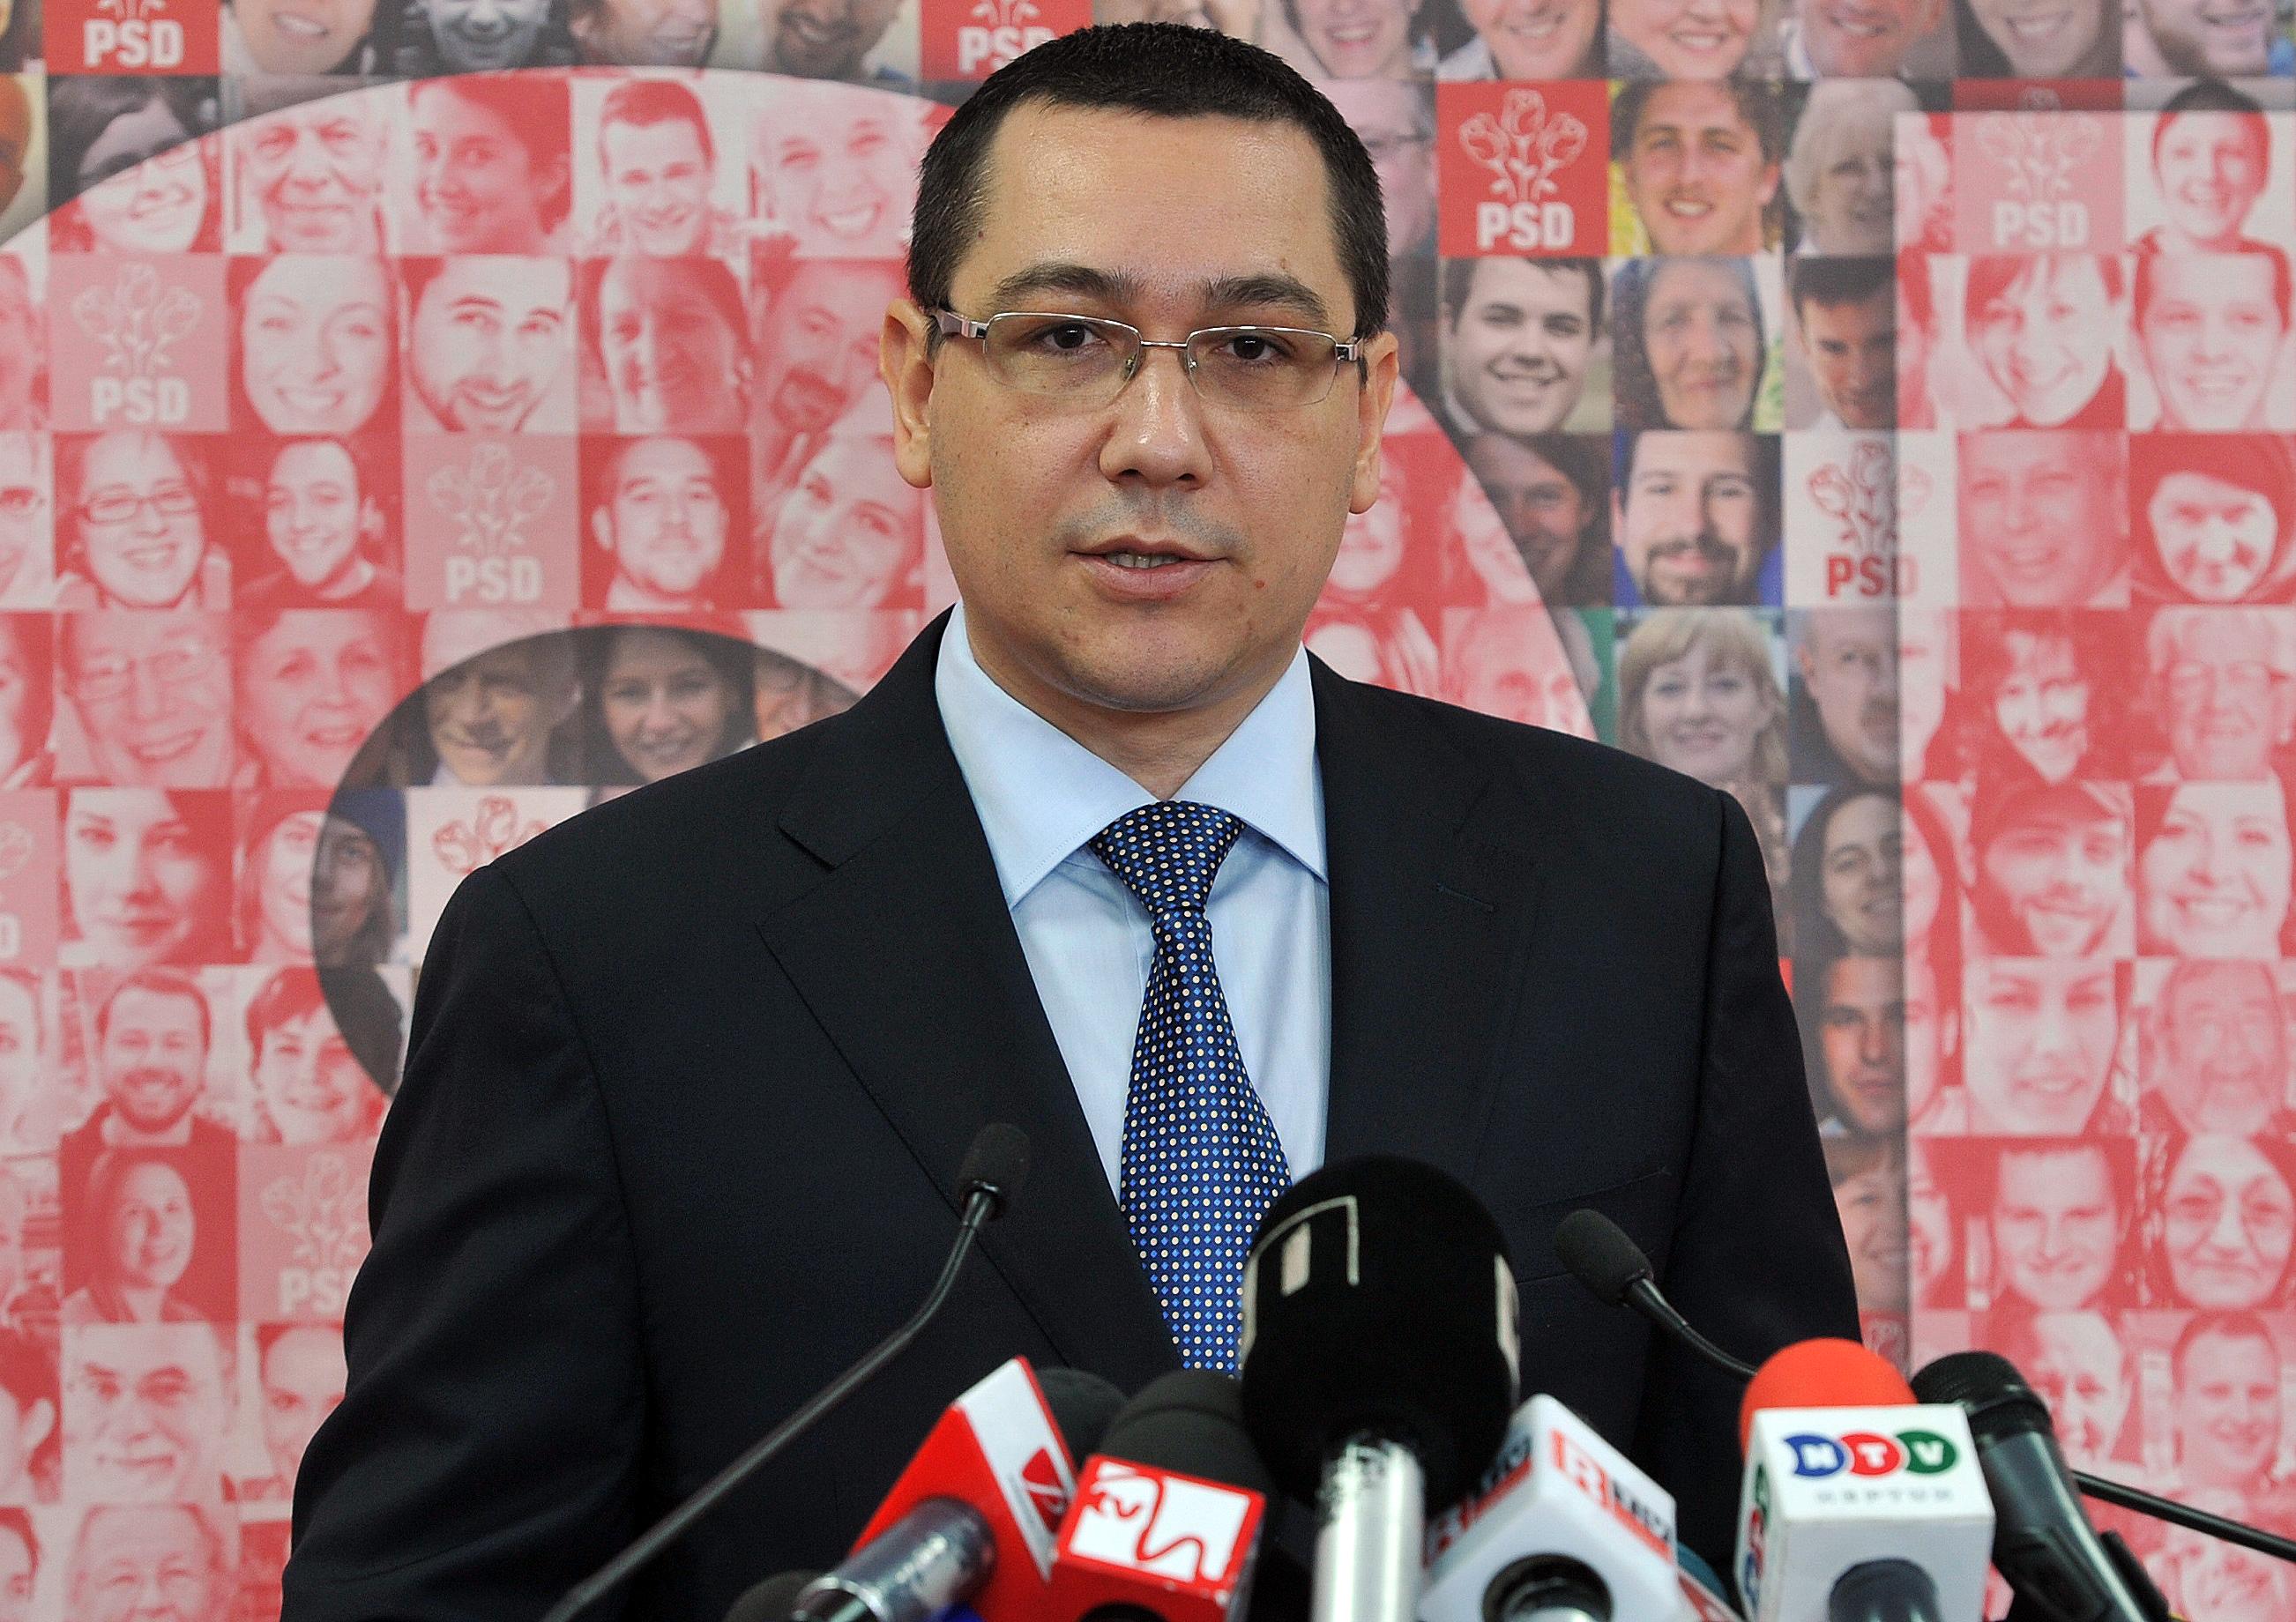 Depiction of Victor Ponta